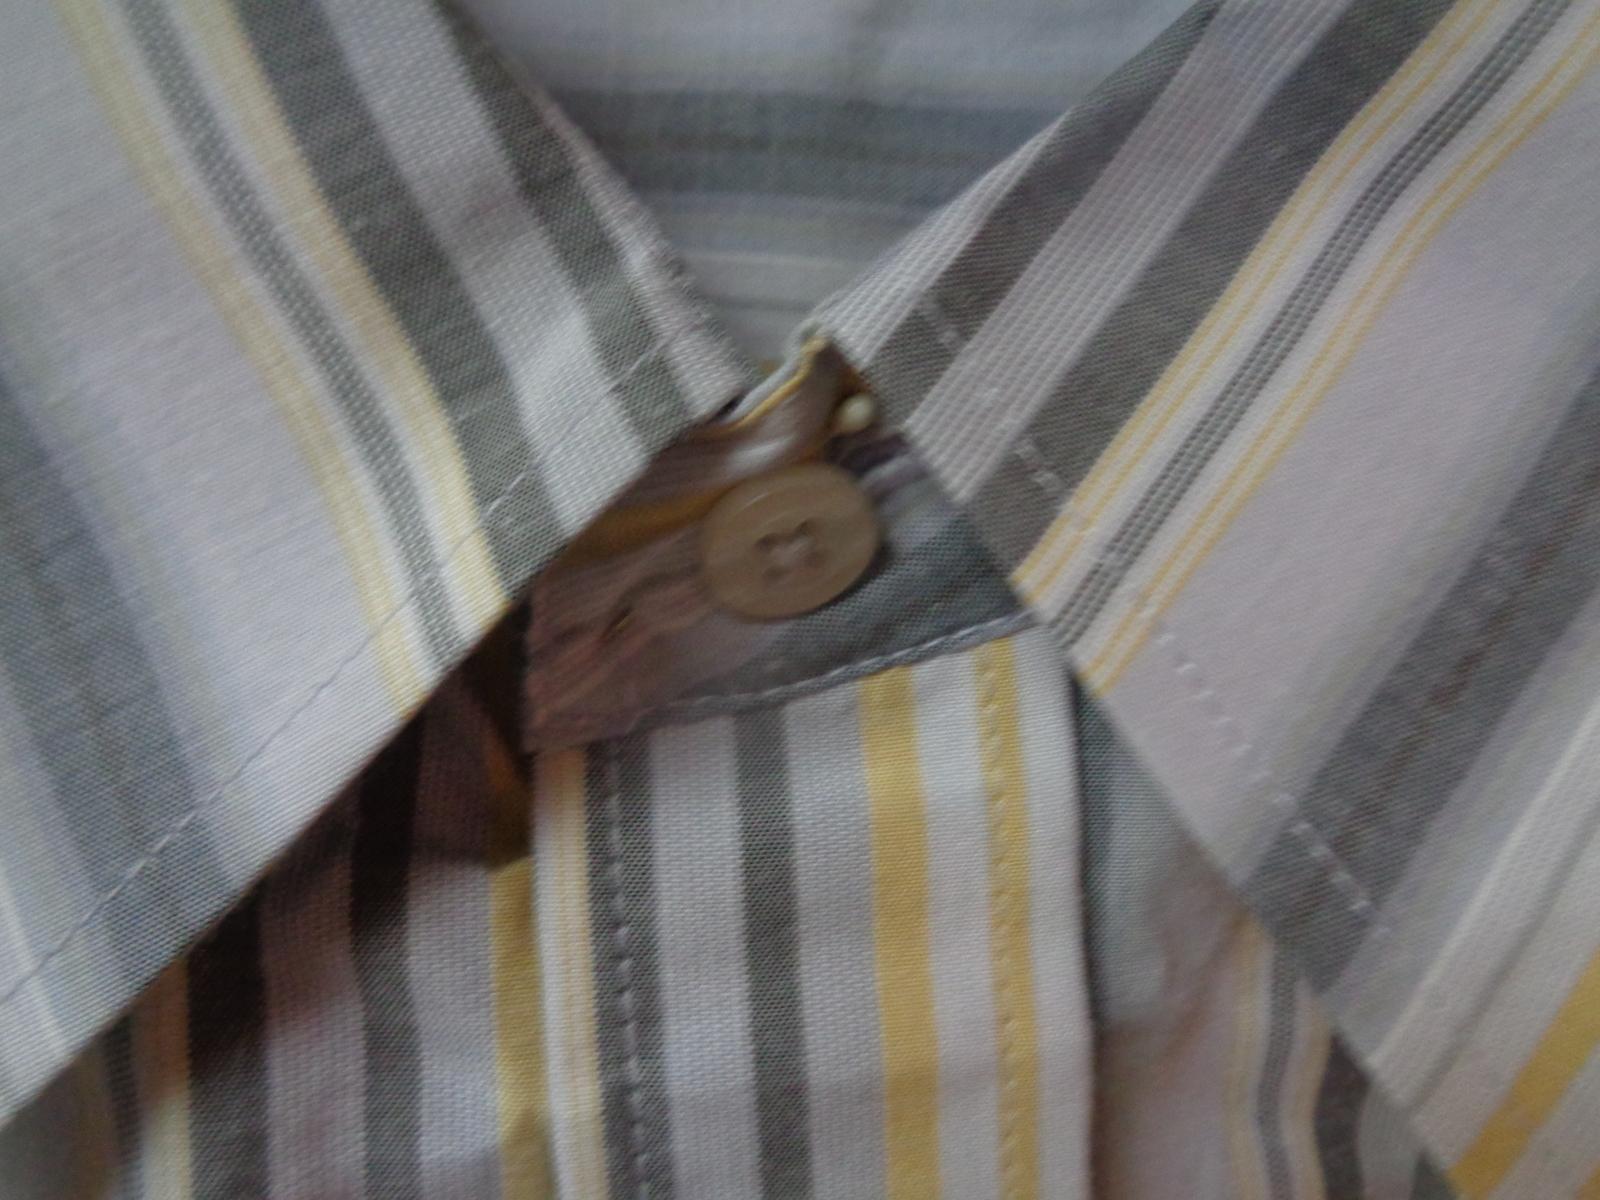 Men's Long Sleeve Dress Shirt Gray & Yellow Striped NWT Sz L Beyond The Limit